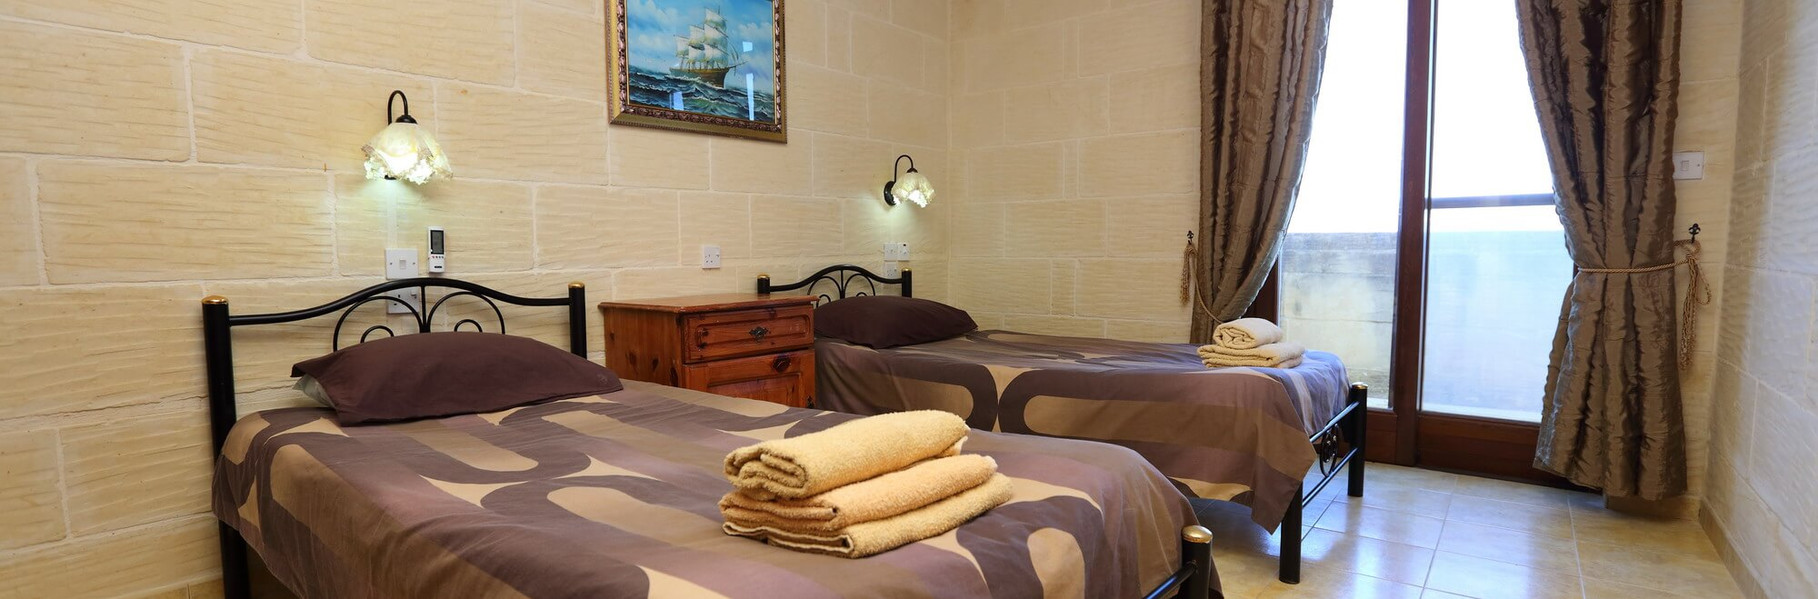 villa2-twin-bed.jpg